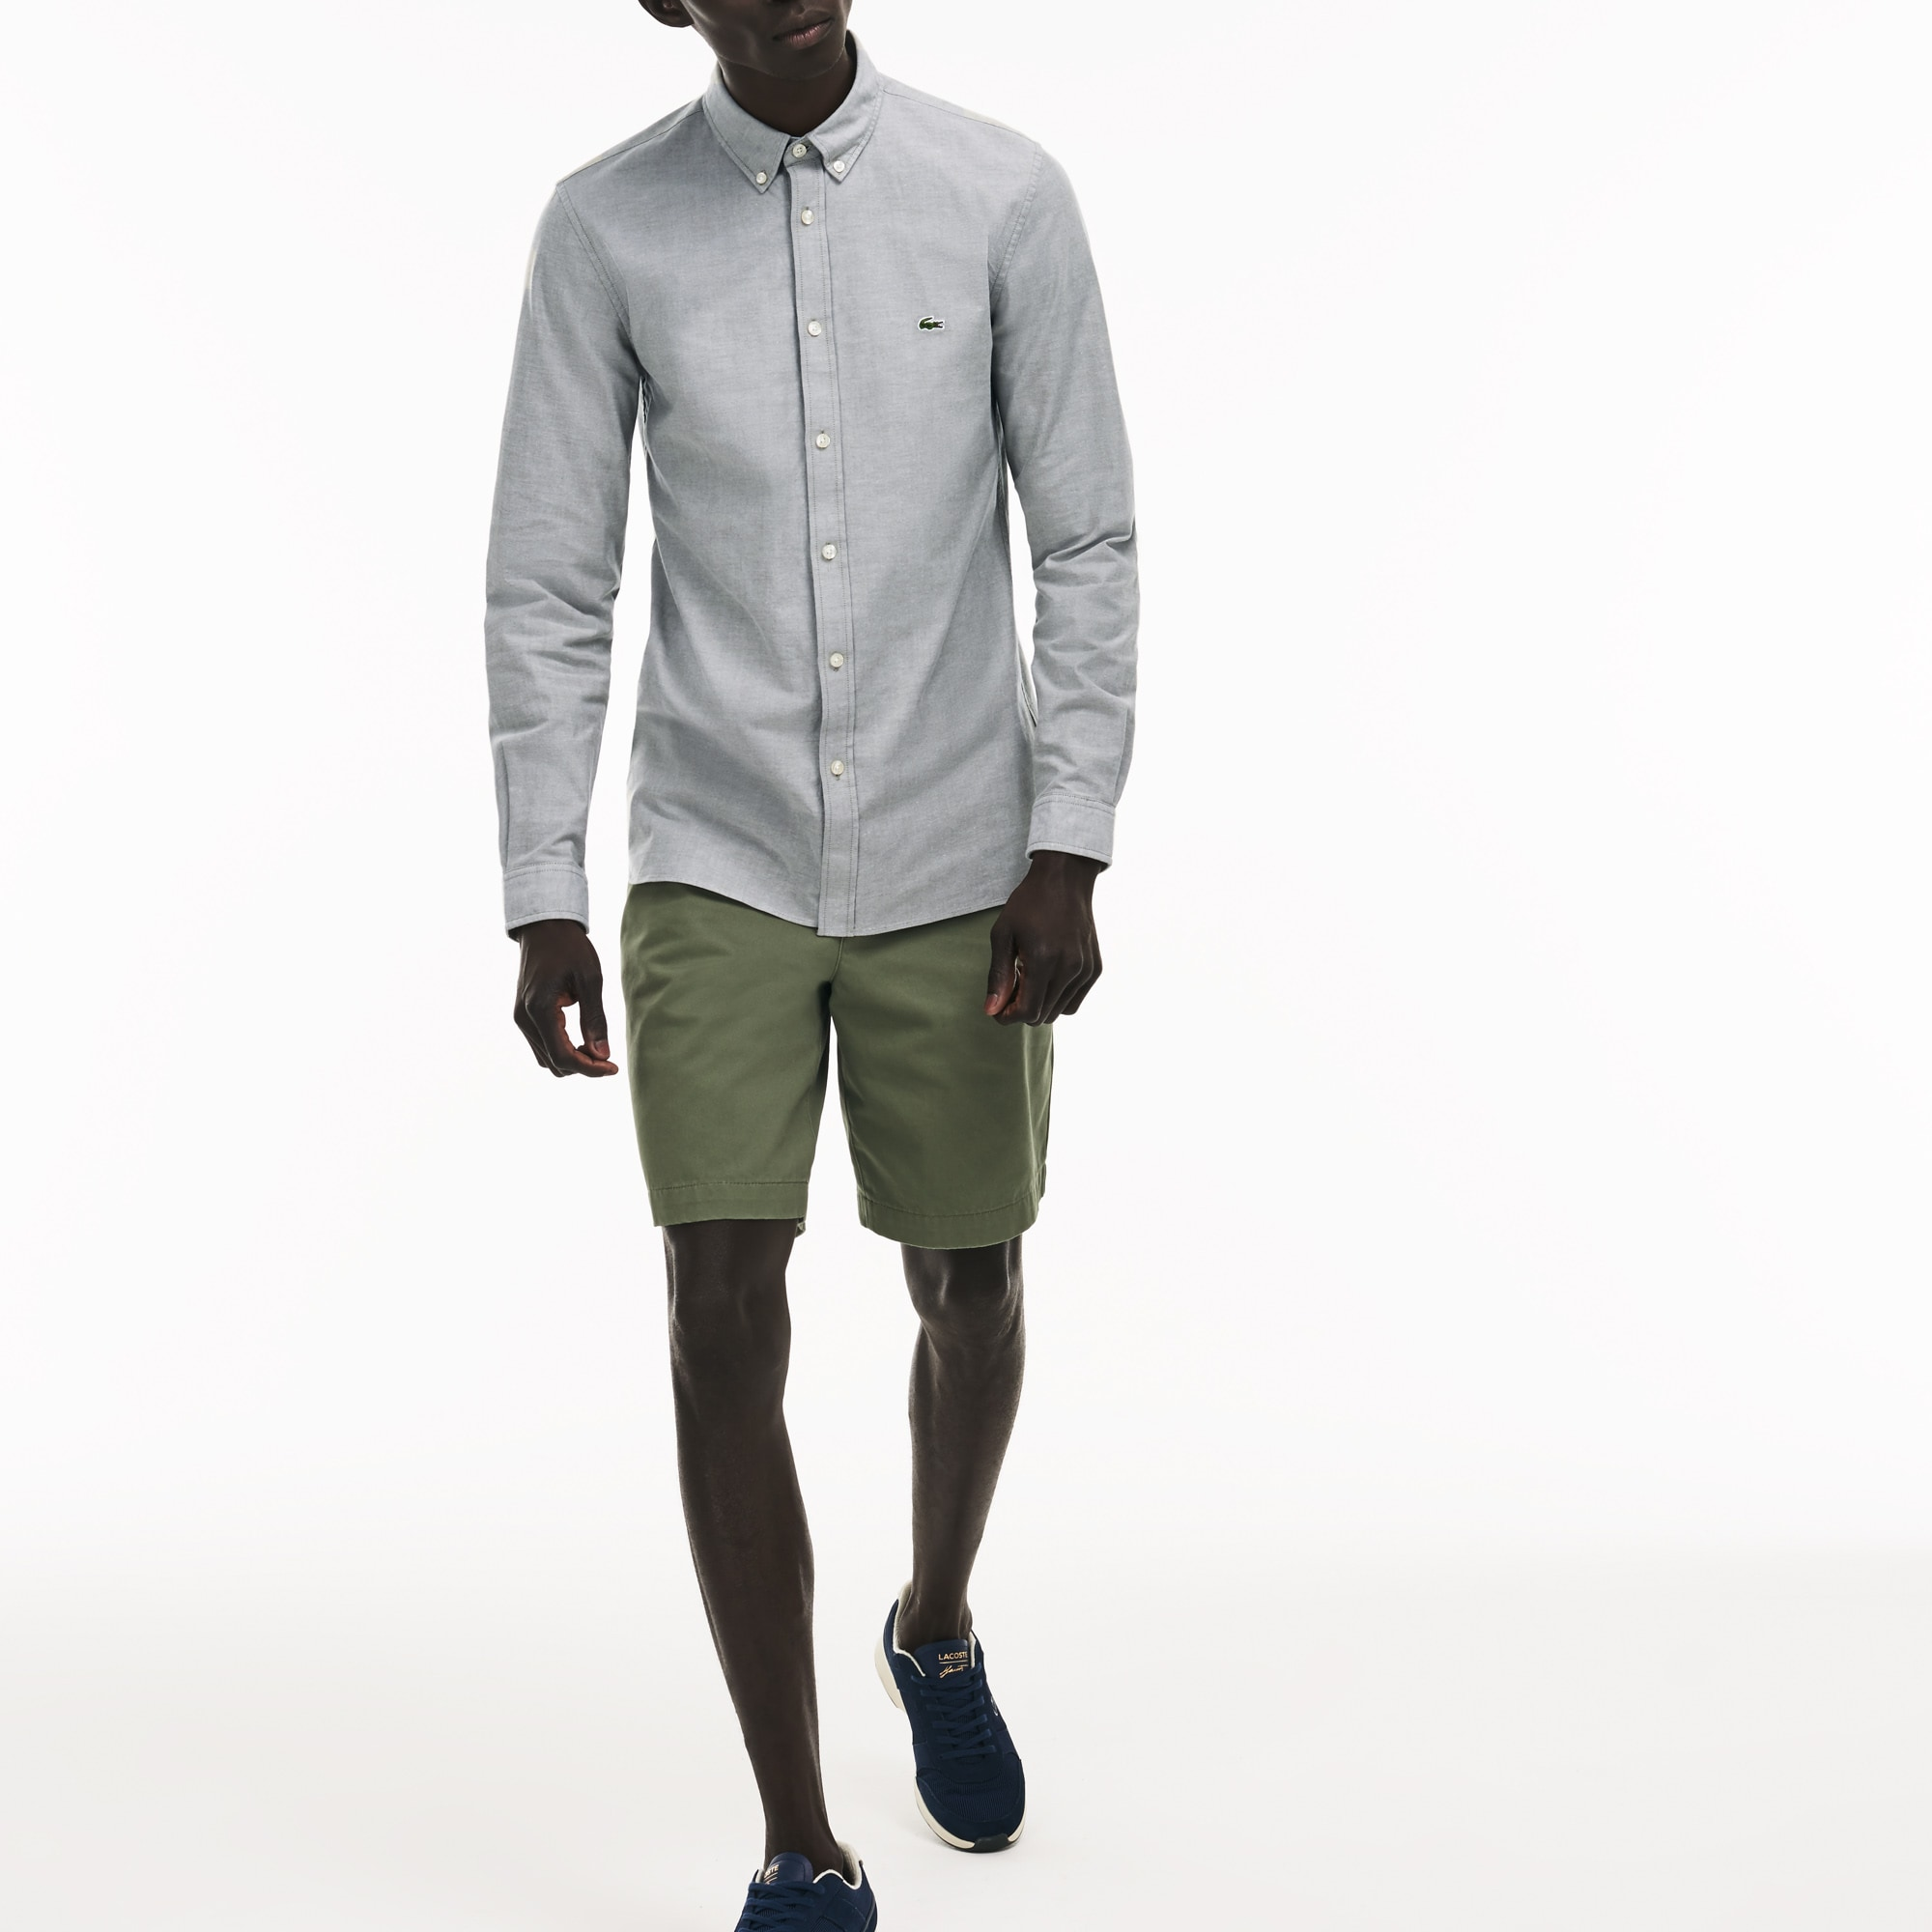 Men's Slim Fit Stretch Cotton Oxford Shirt